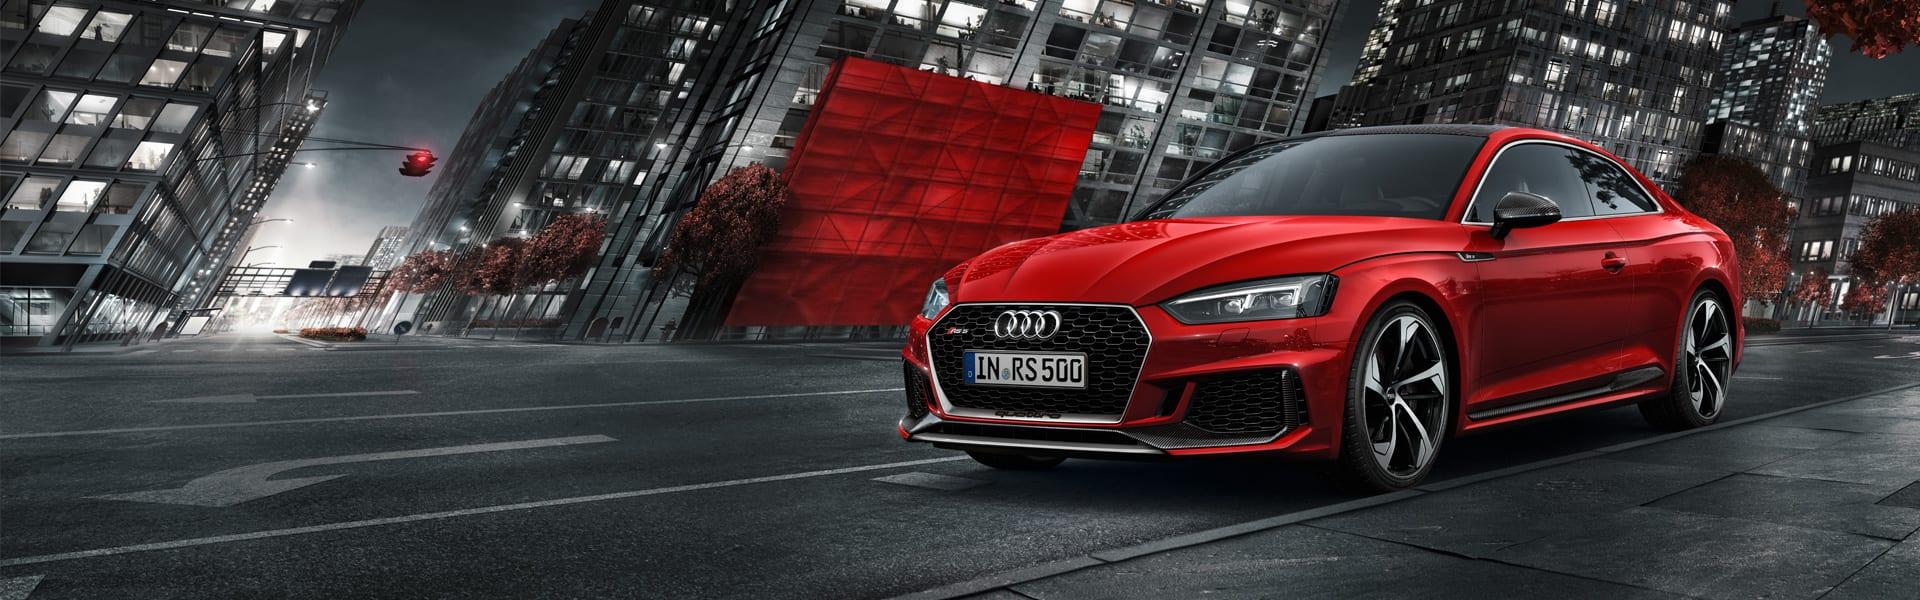 Audi Philippines - Audi online payment